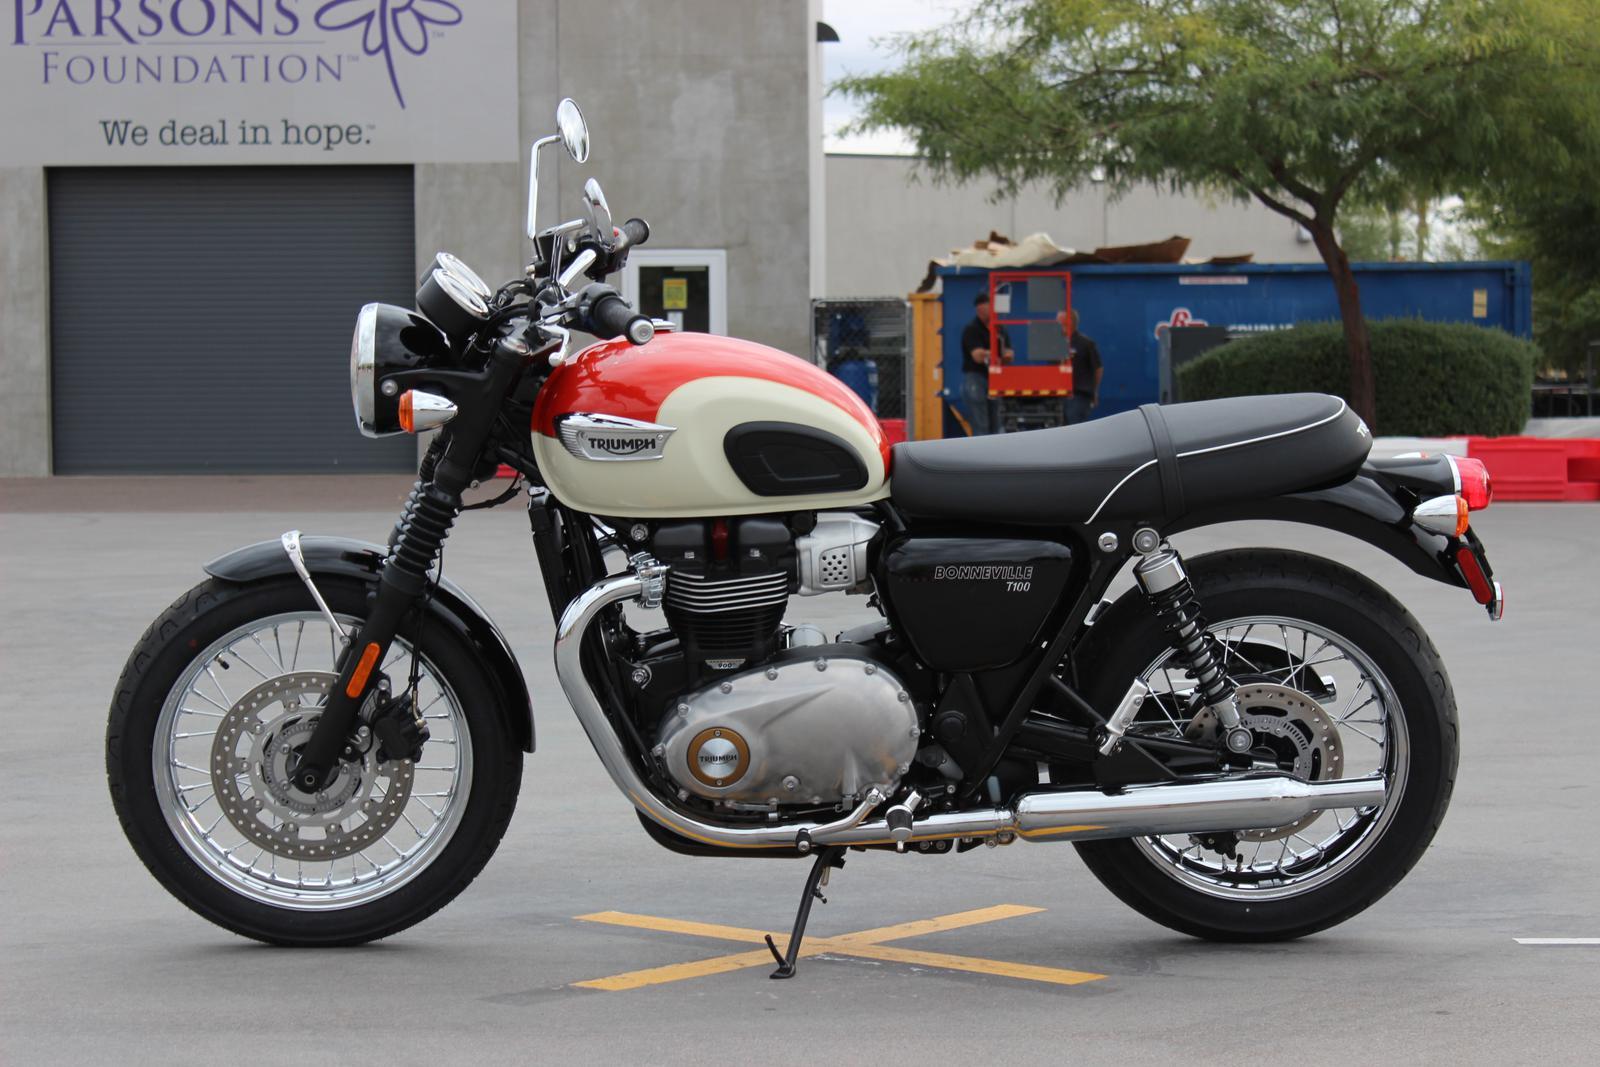 Triumph Bonneville Accessories идеи изображения мотоцикла